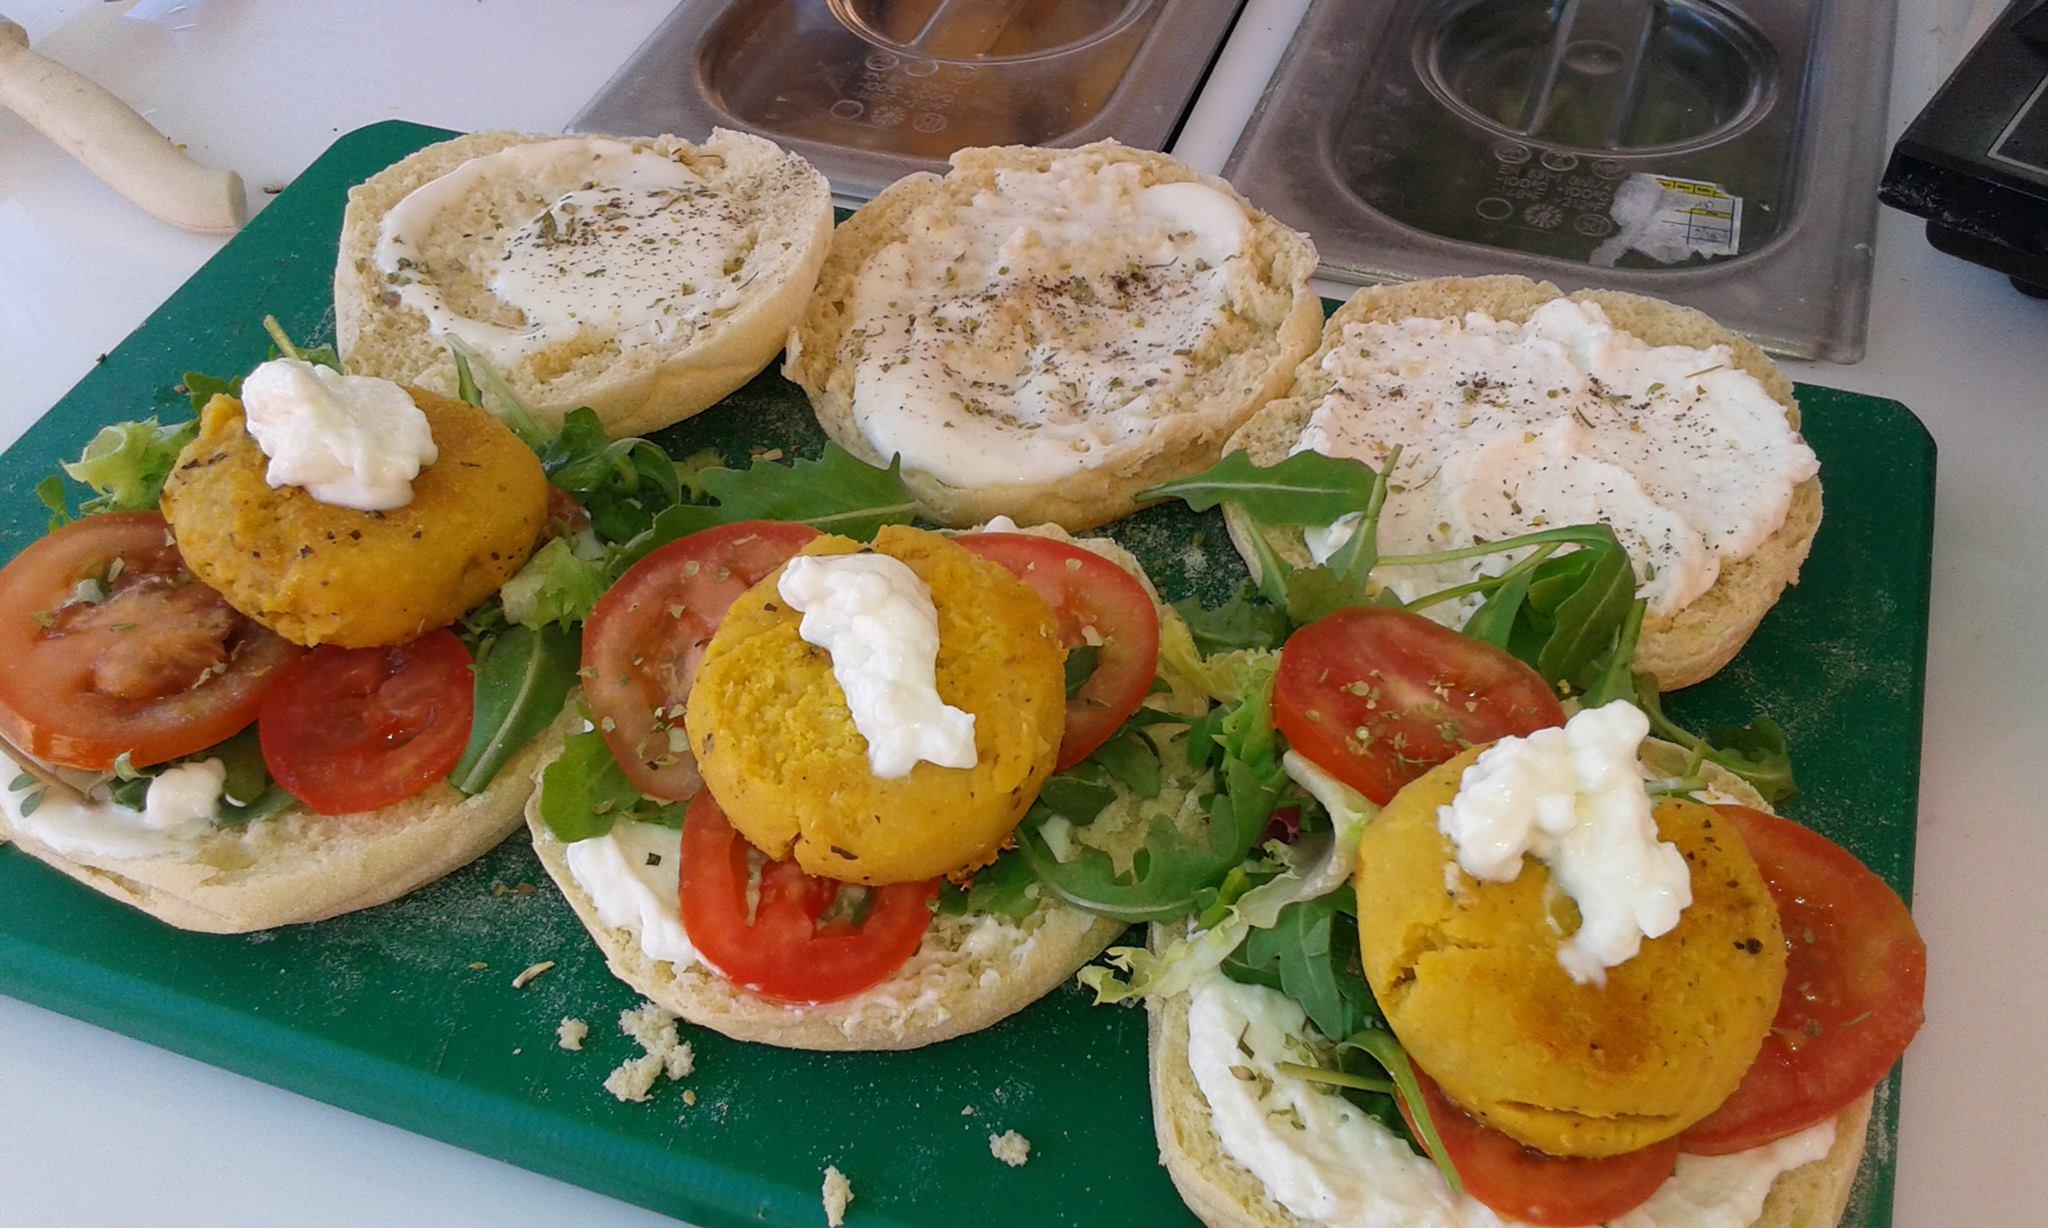 Burgers vegetariens du foodtrucks 100porcentosaboroso - streetfood - lisbonne